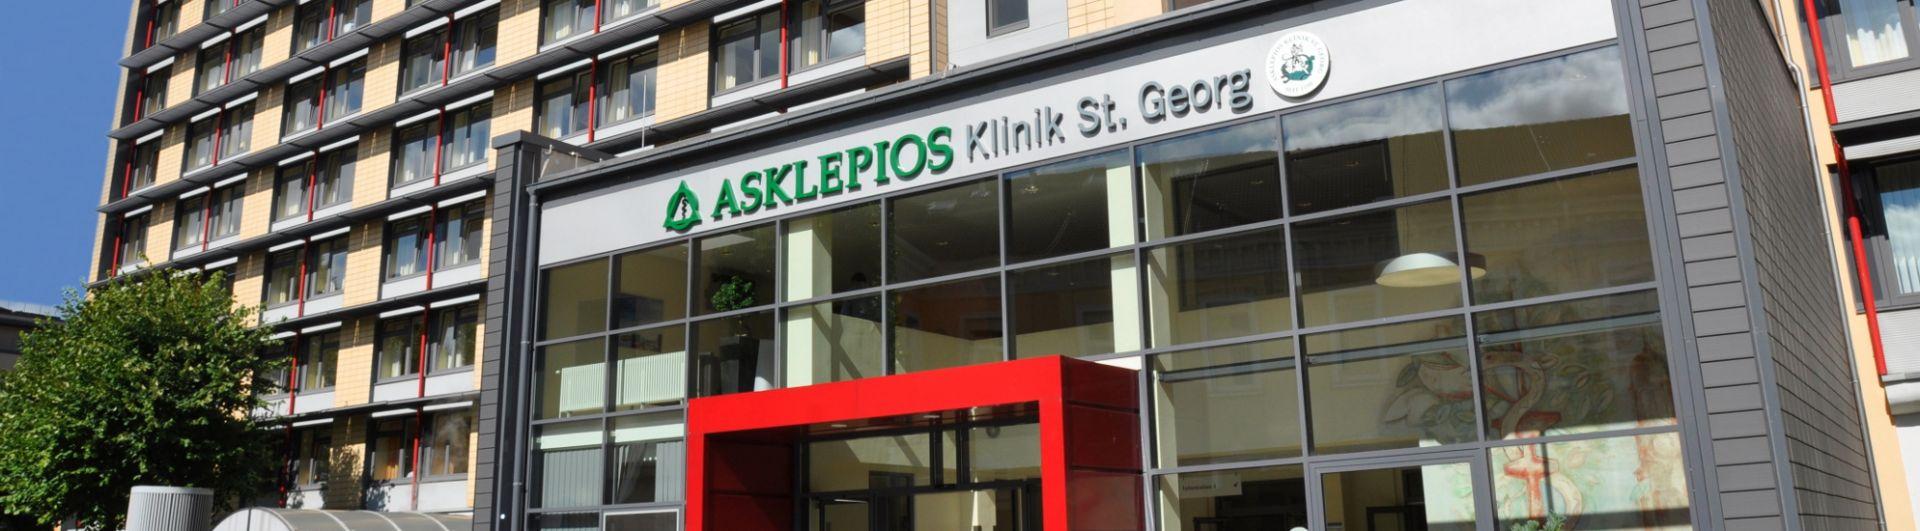 Asklepios Klinik St. Georg